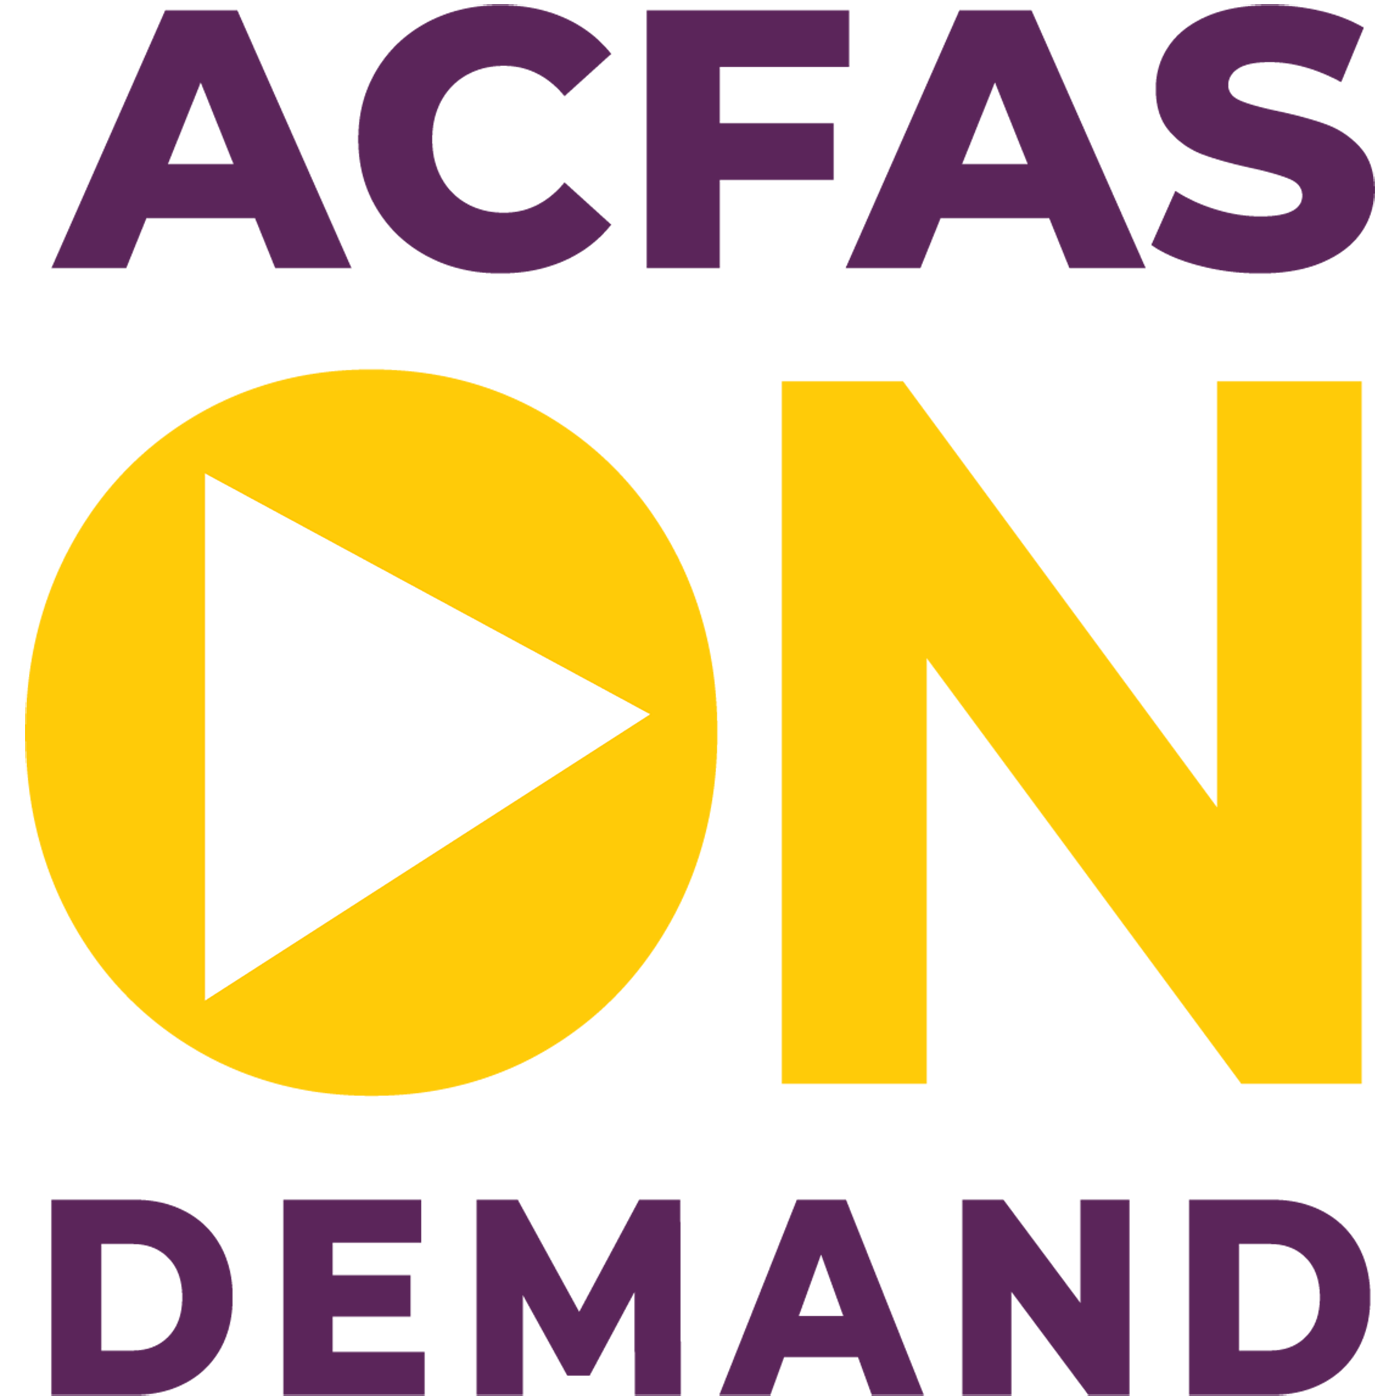 ACFAS On Demand show art